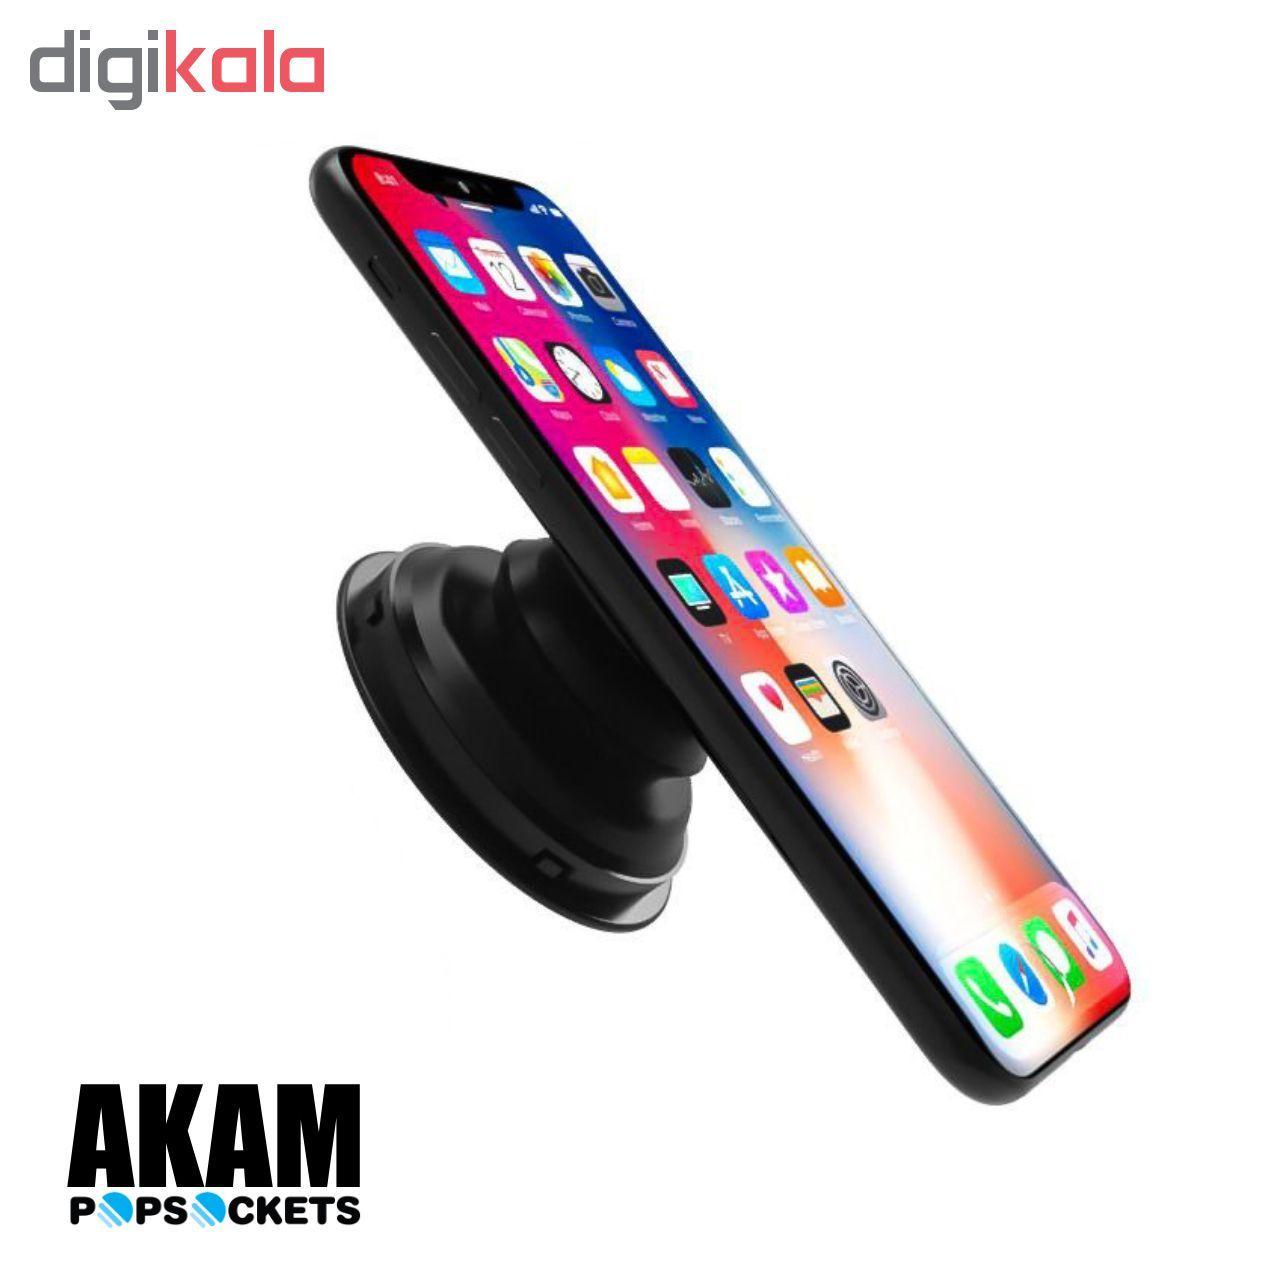 پایه نگهدارنده گوشی موبایل پاپ سوکت آکام مدل APS0056 main 1 7